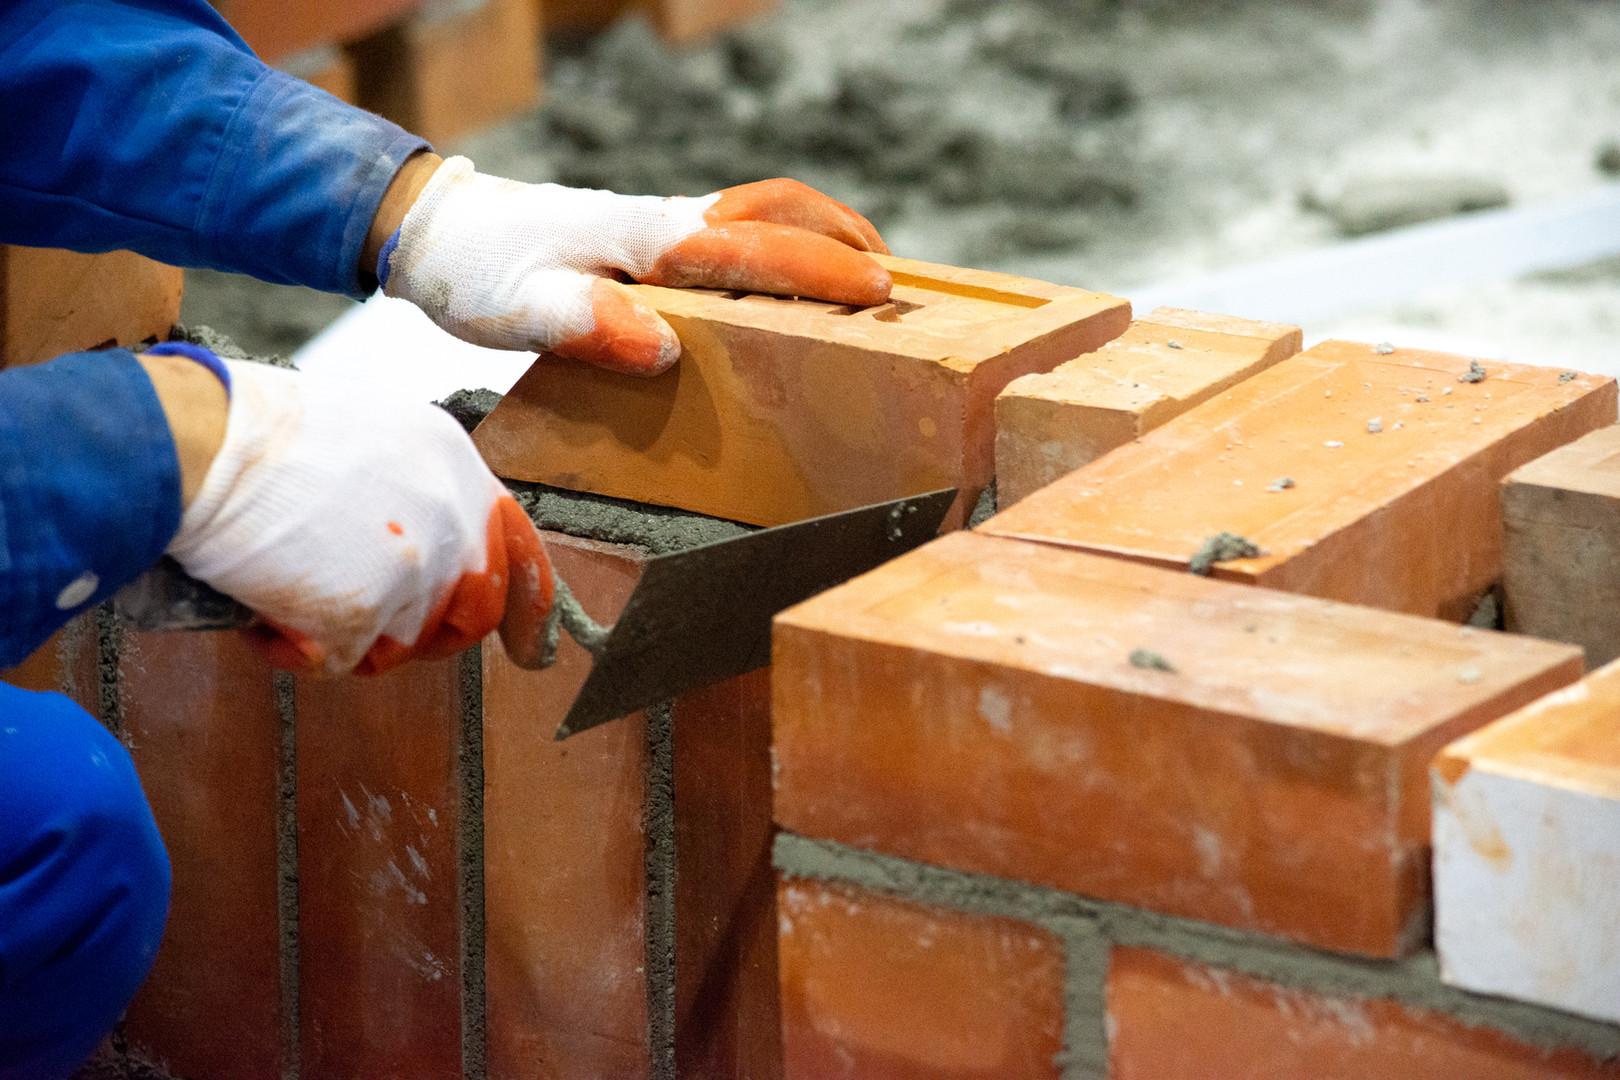 Bricklayer installing bricks, Bricklayer